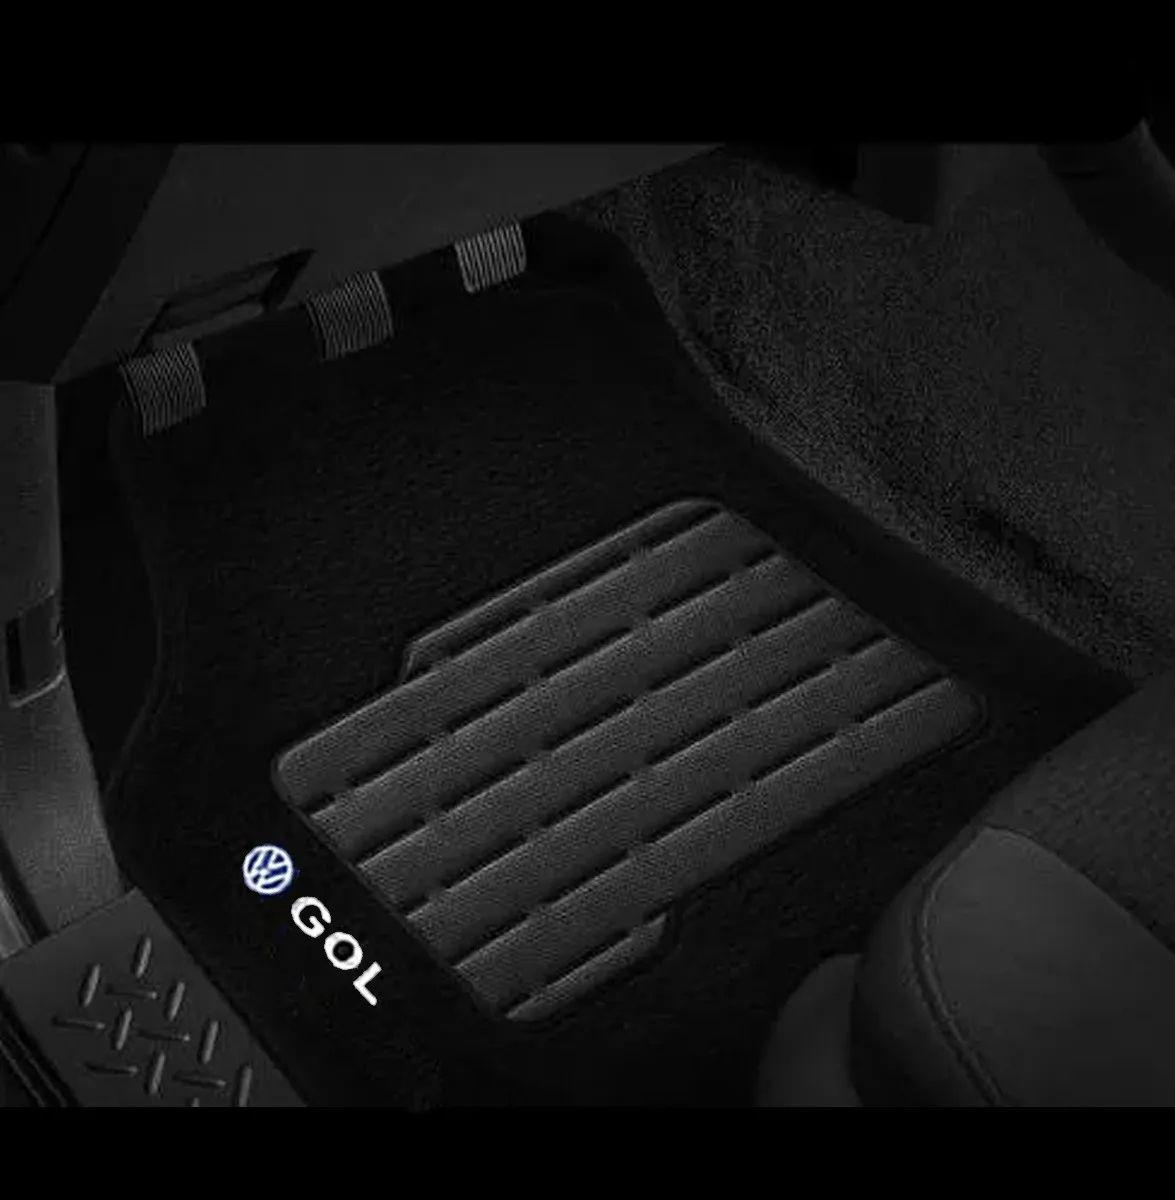 Jogo de Tapete Carpete Automotivo Gol G2 G3 G4 G5 Logo Bordado Volkswagen Preto Personalizado Vw